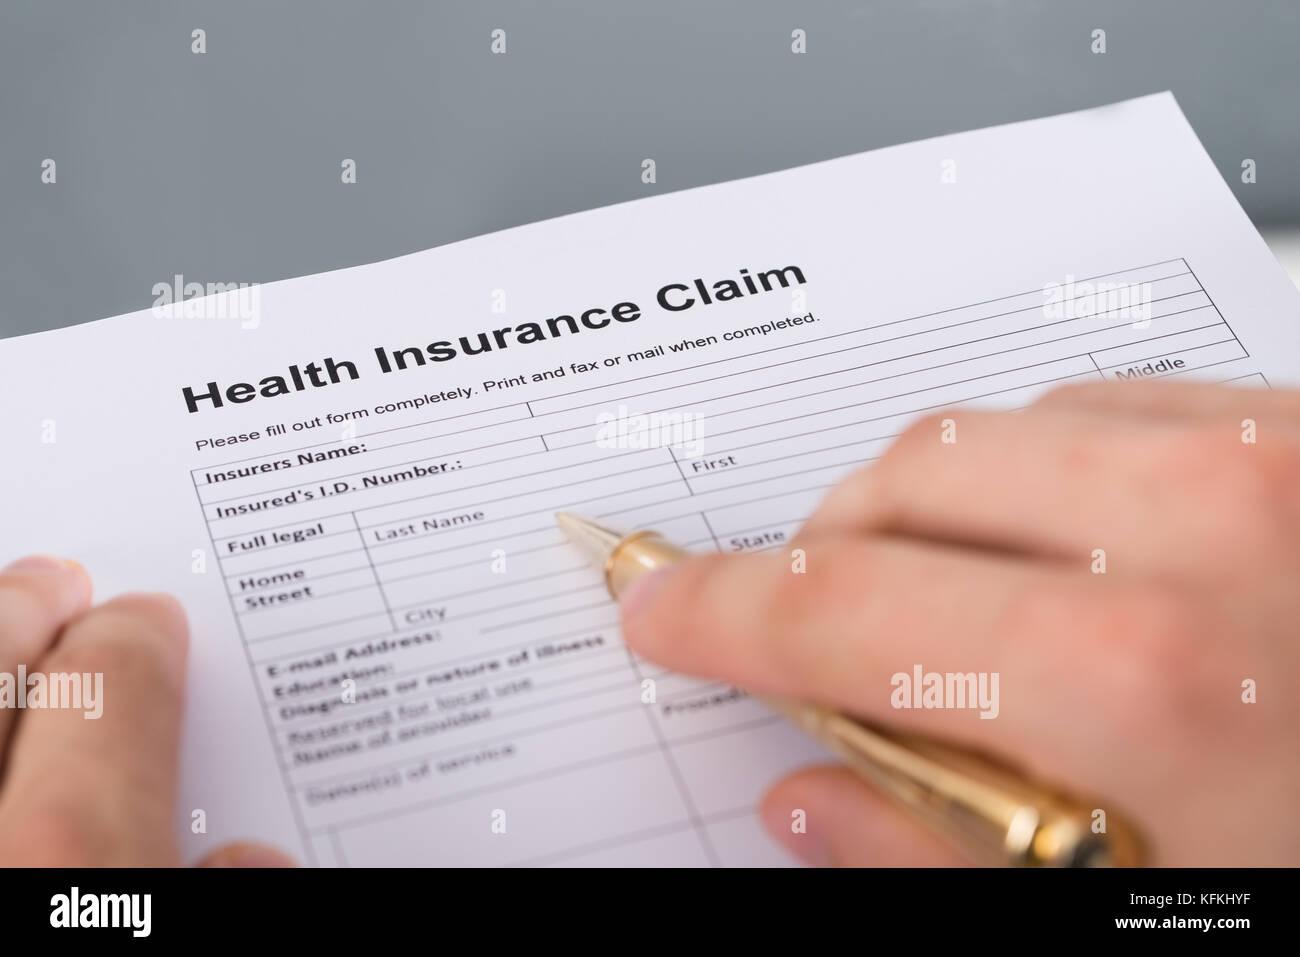 Hand filling health insurance claim form. Closeup shot - Stock Image